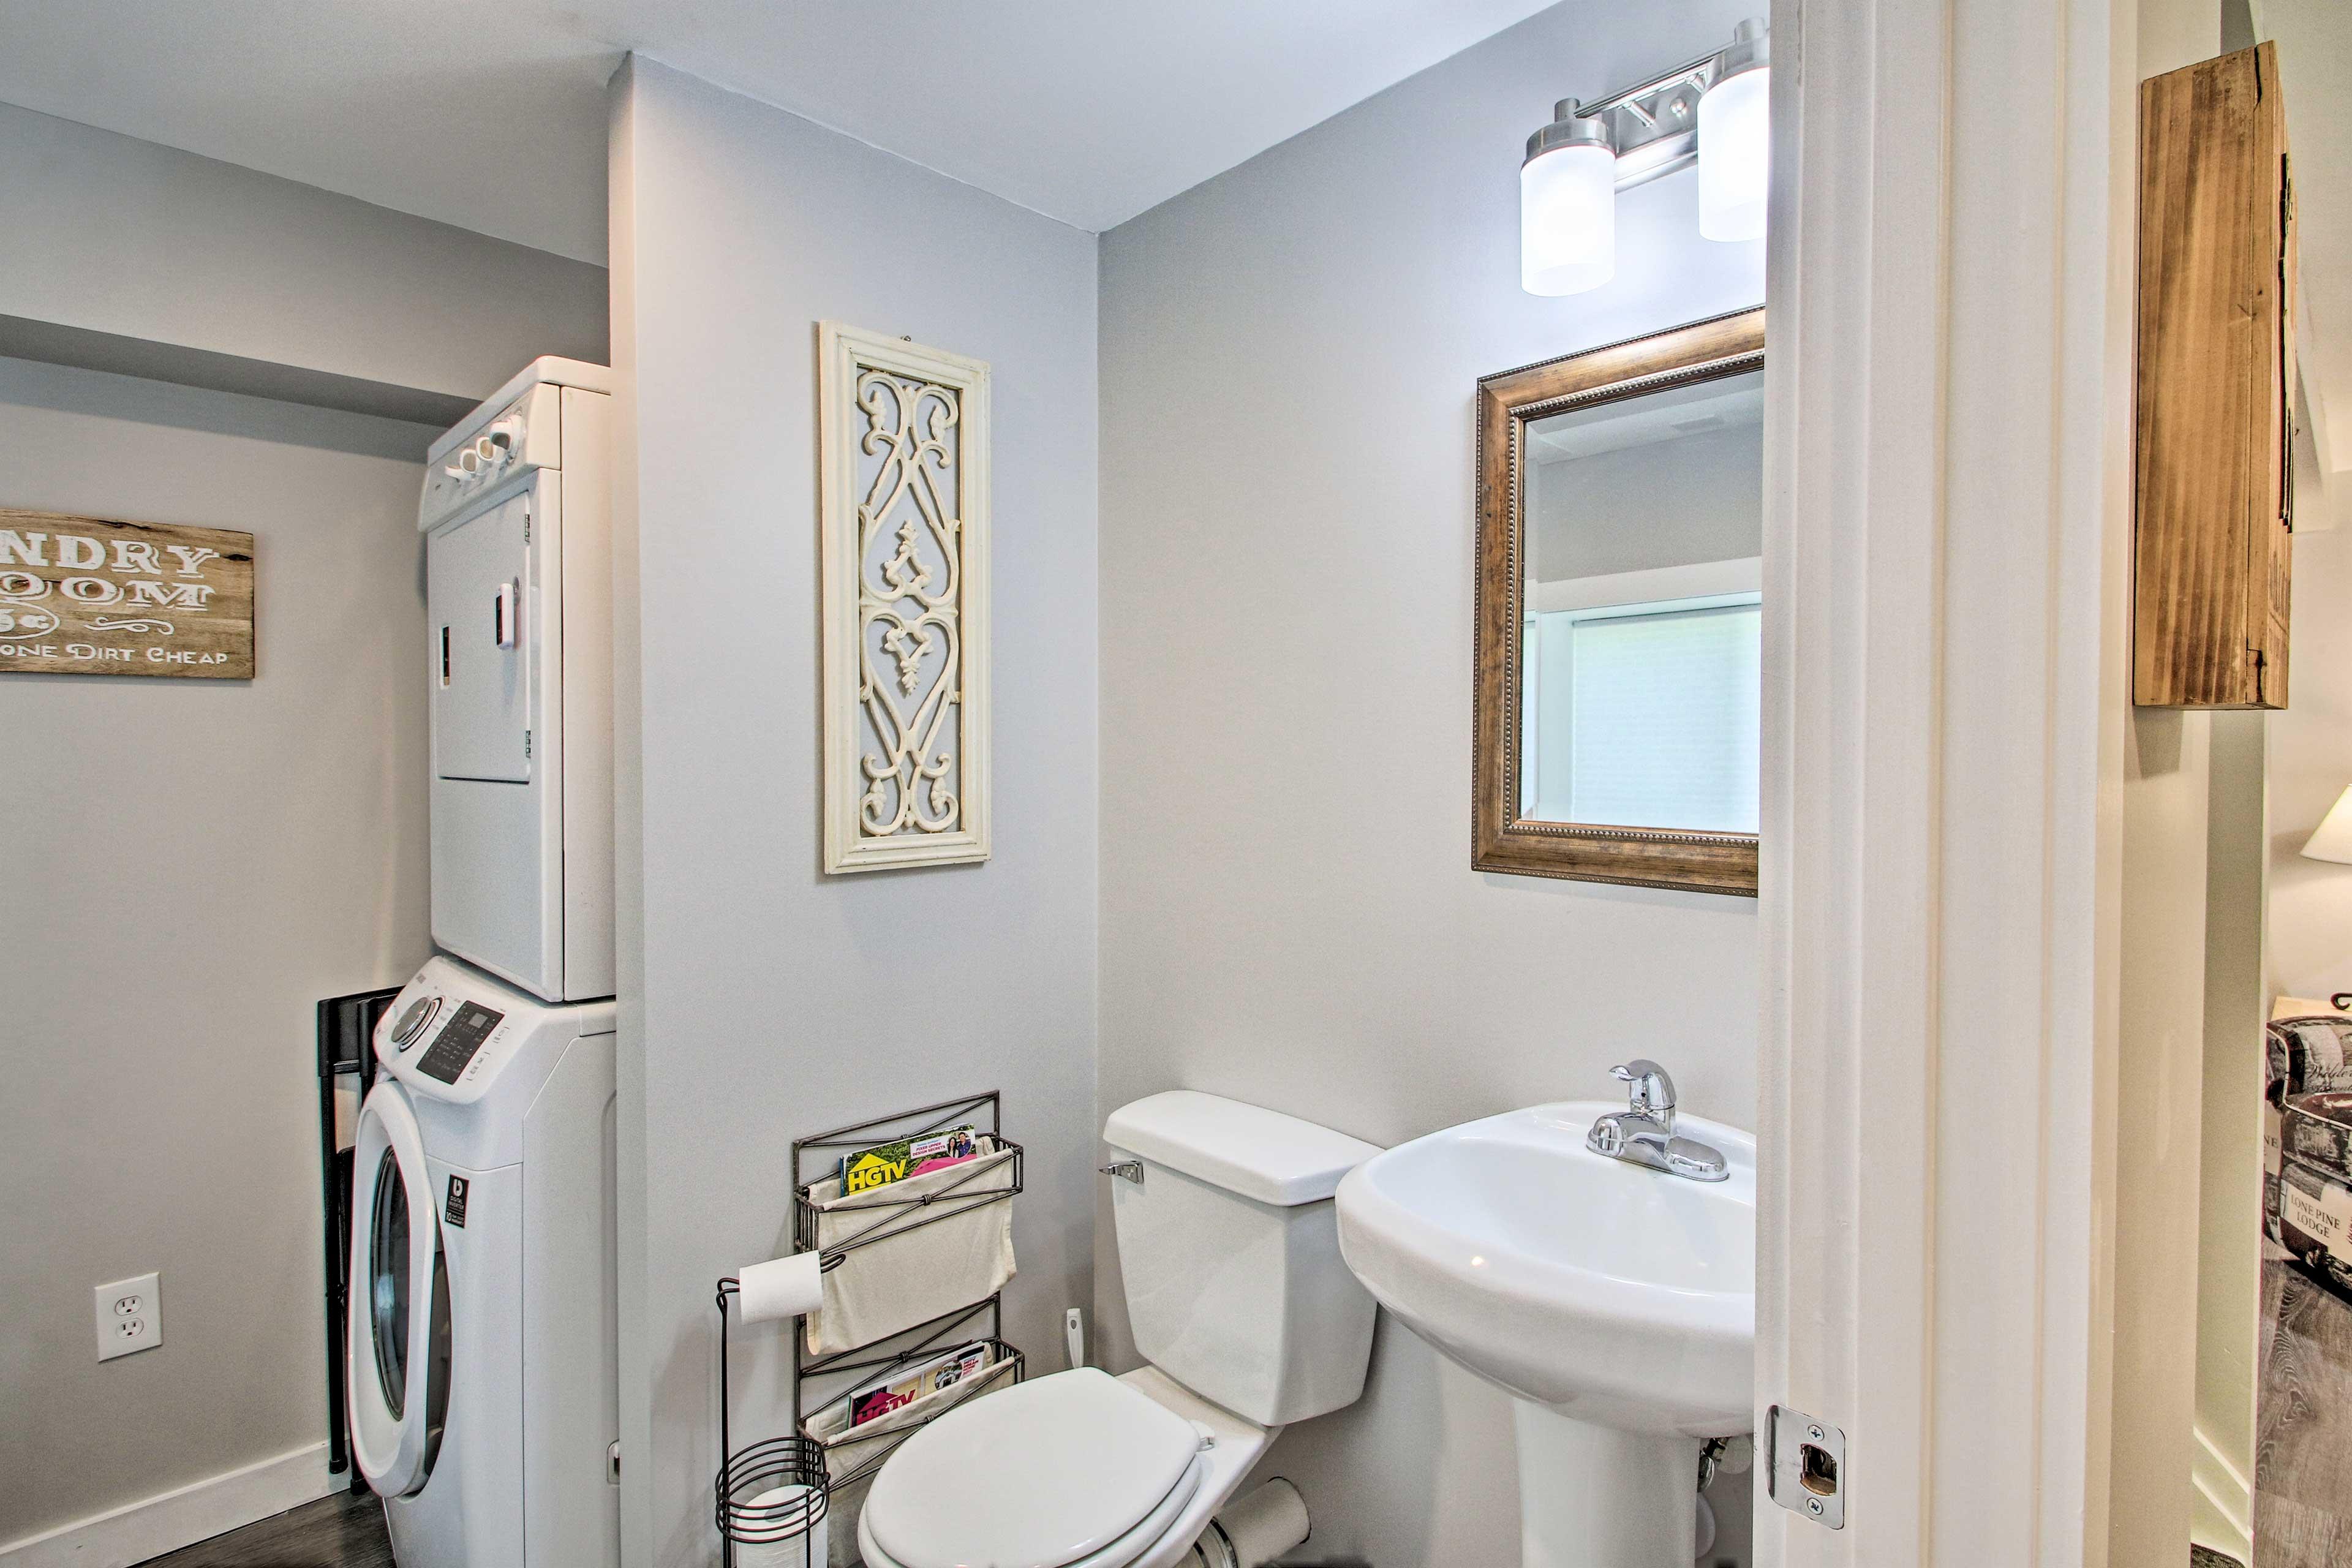 The home also conveniently includes a half bath.